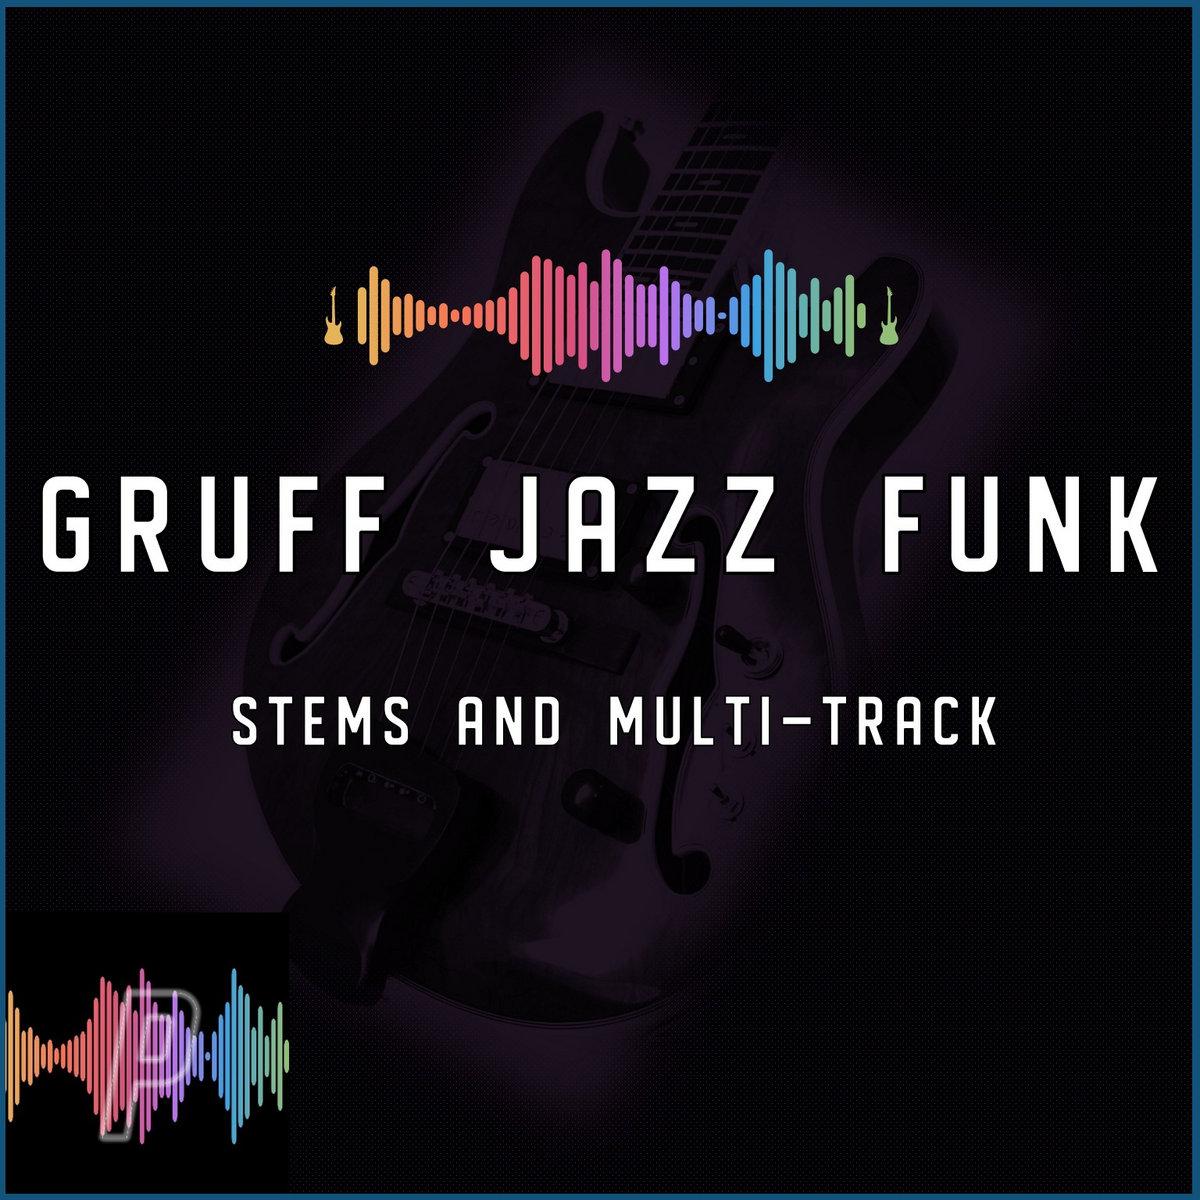 Gruff Jazz Funk in E Dorian at 110 BPM Stems and Multi-Tracks